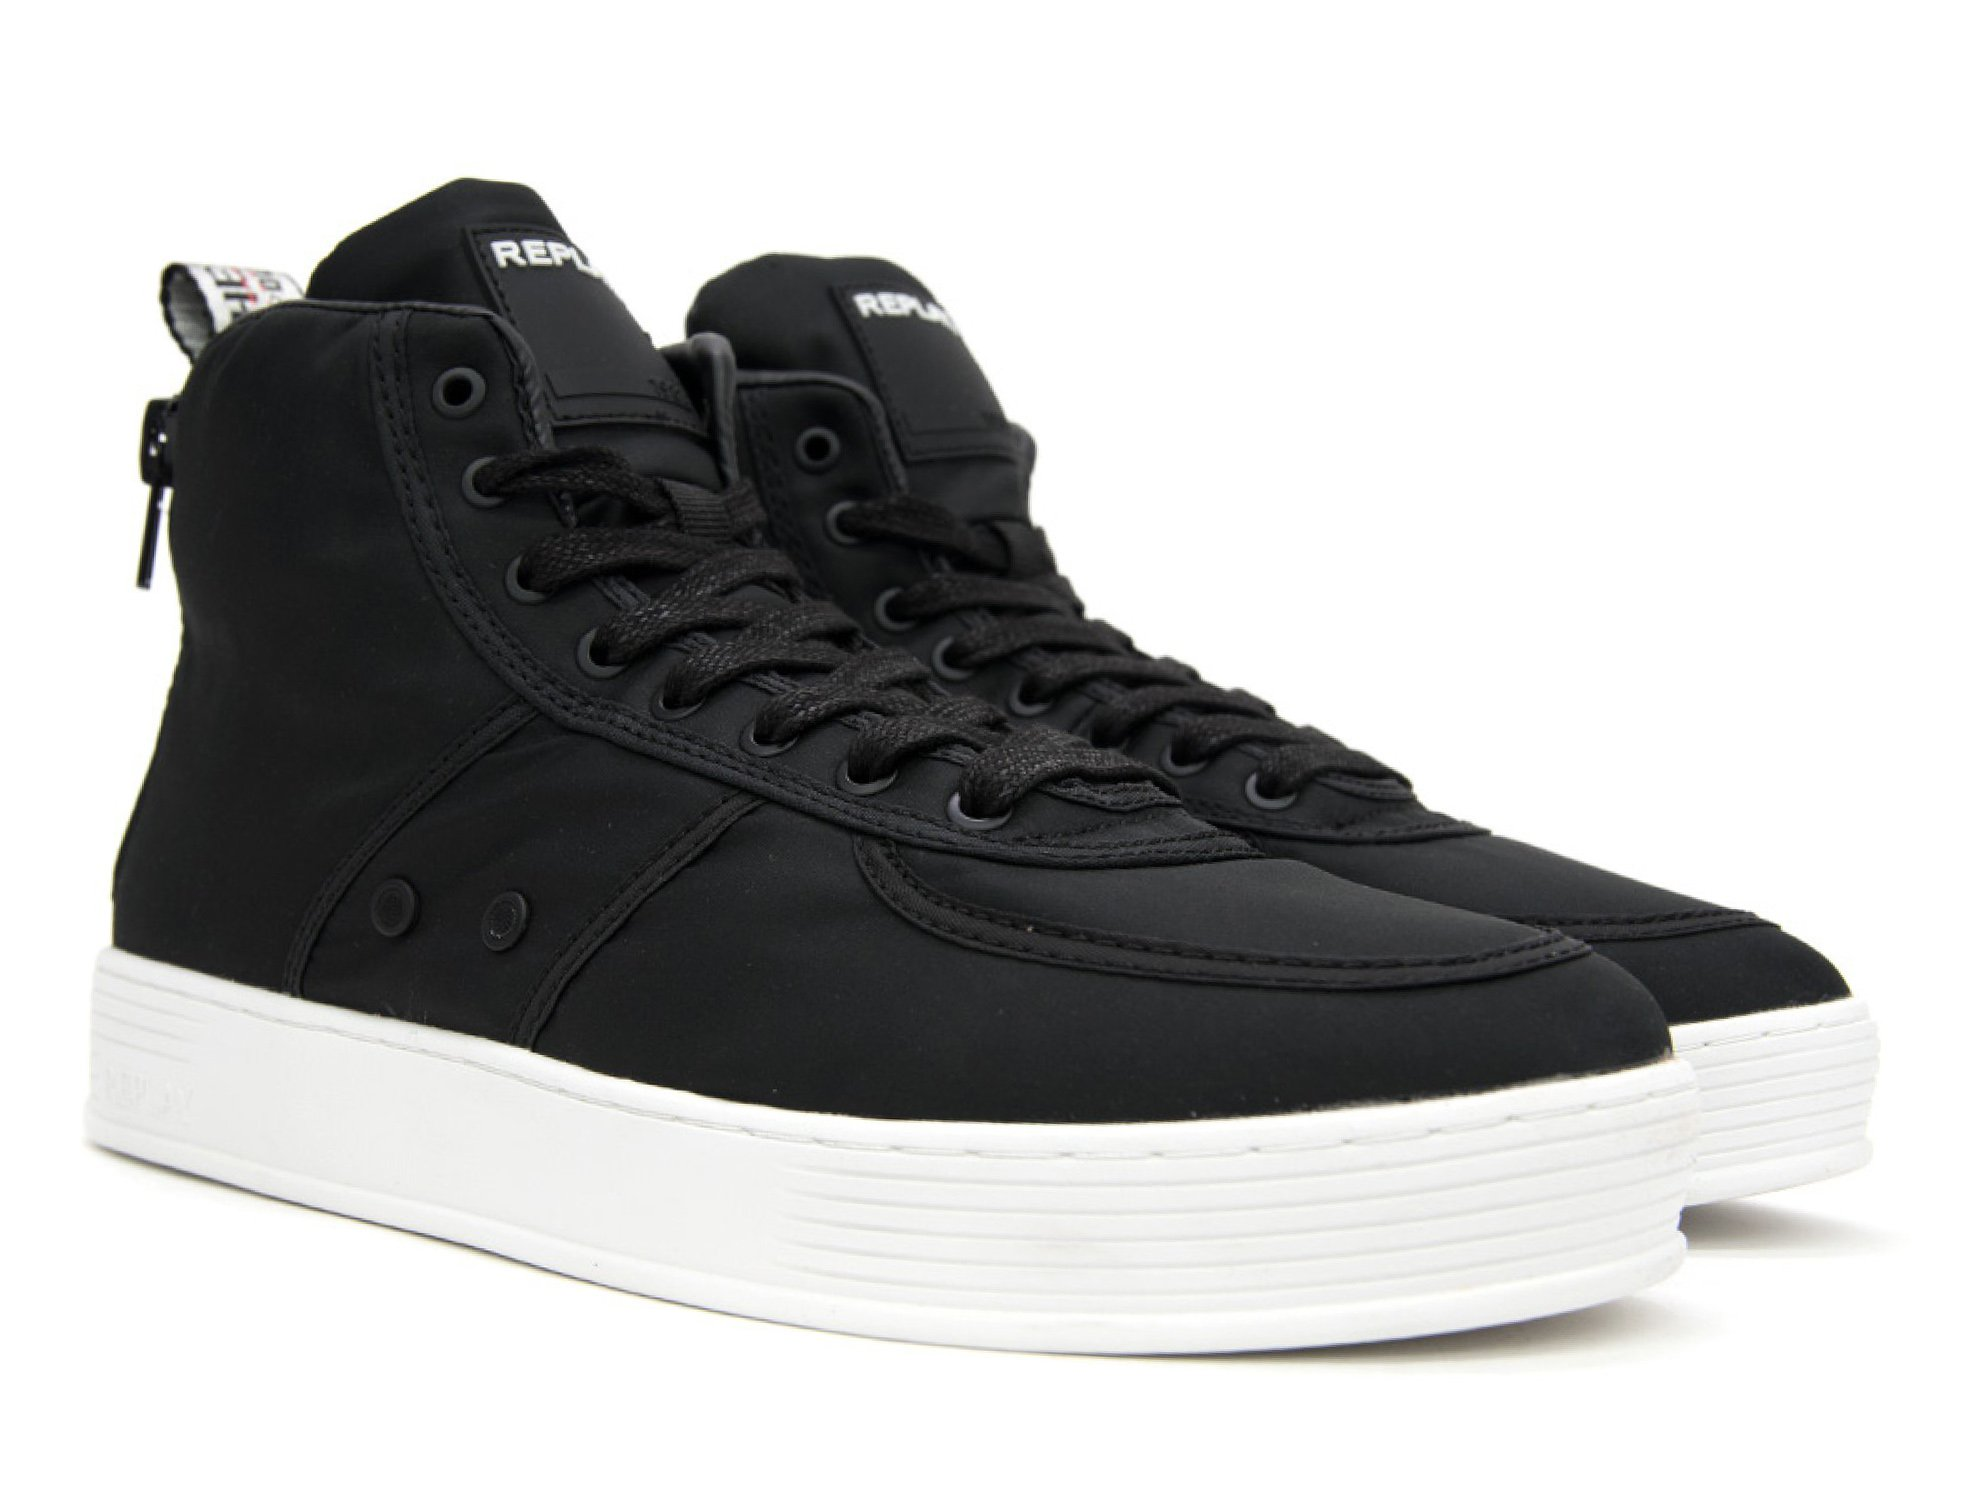 c332d220022 Replay Danford RZ970014S Μαύρο | Apostolidis Shoes